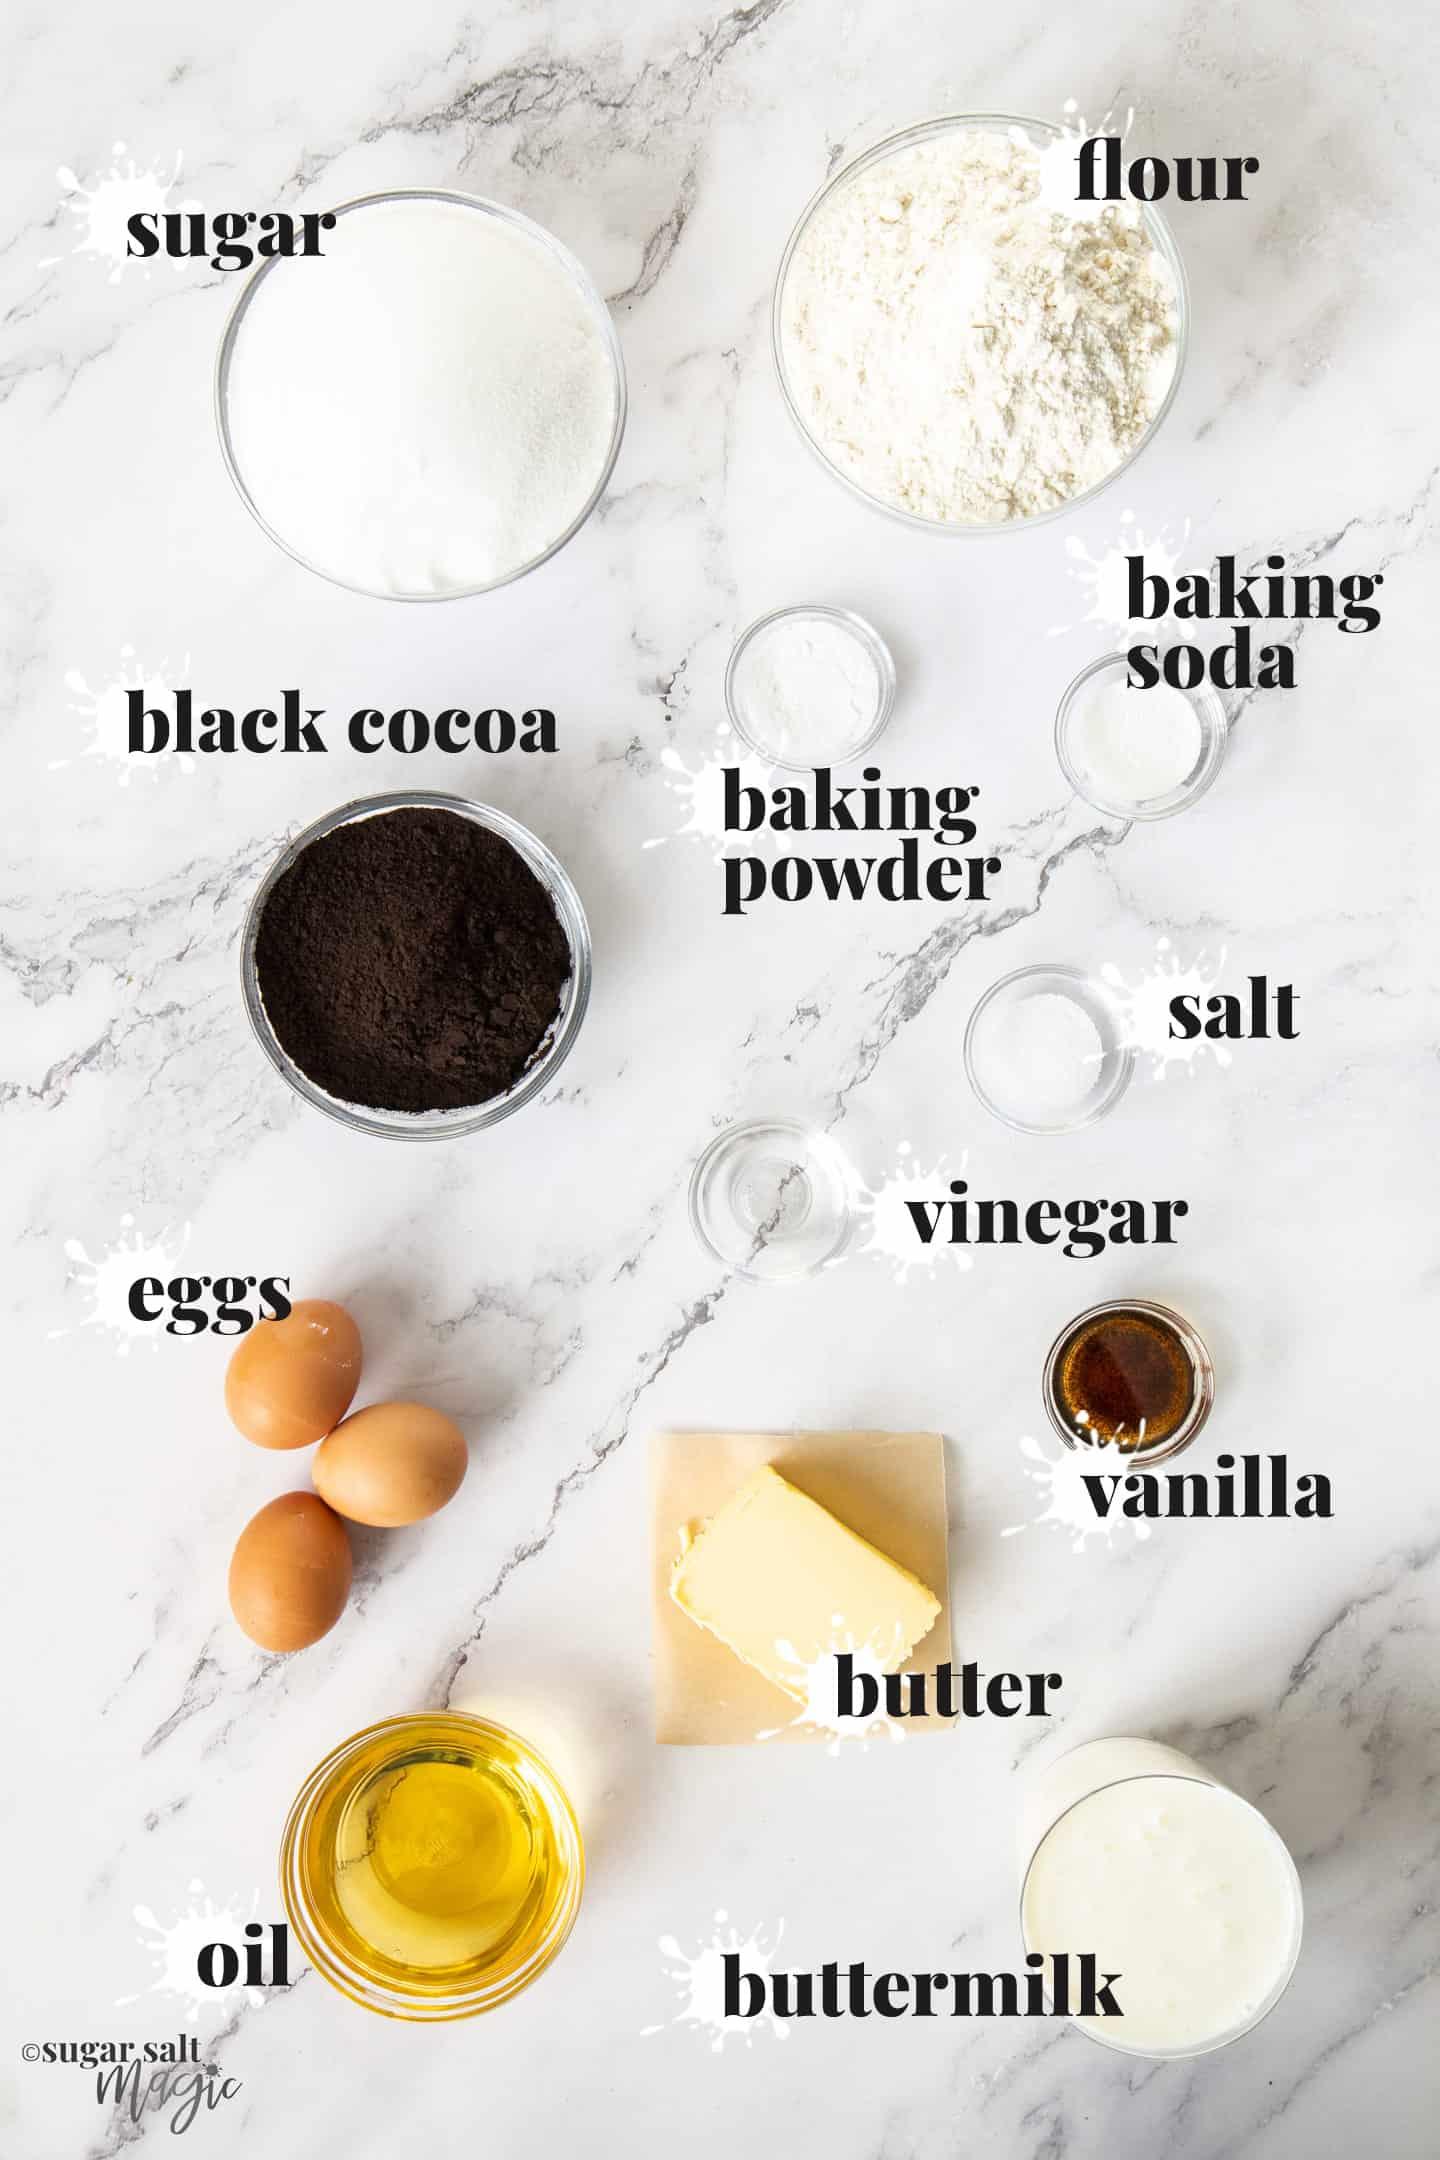 Ingredients for black velvet cake on a marble surface.